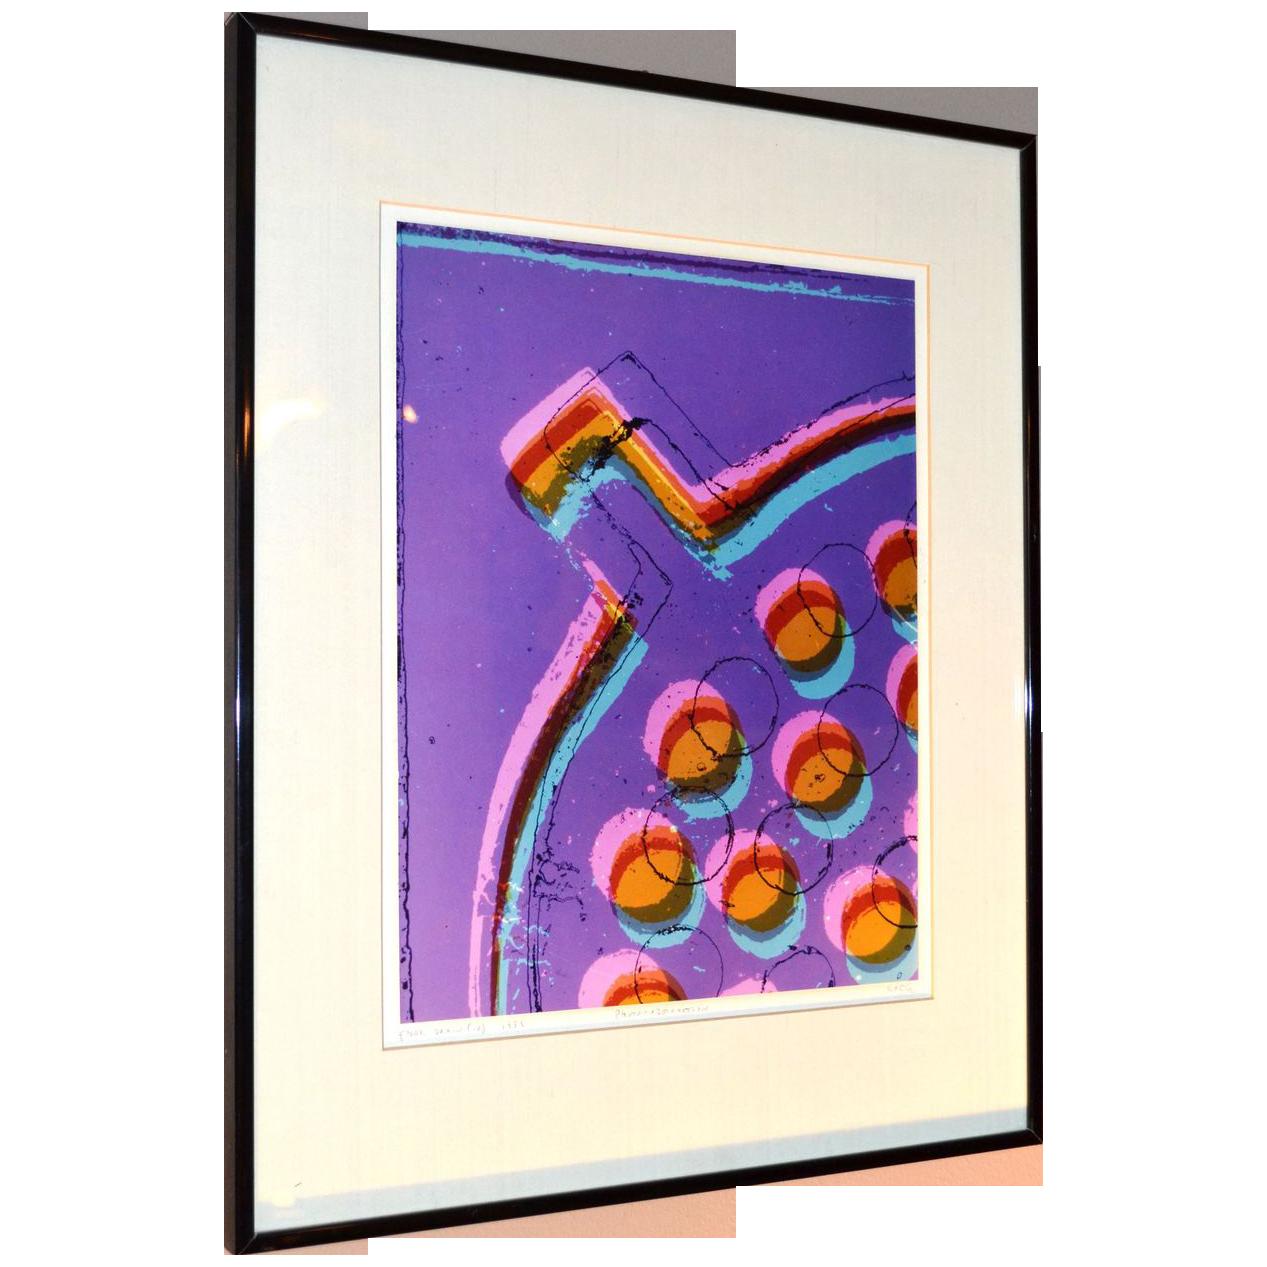 Circa 1981 Karen Goldstein 'Floor Drain' Abstract Purple, Pink & Blue Photograph Wall Art in Original Black Frame